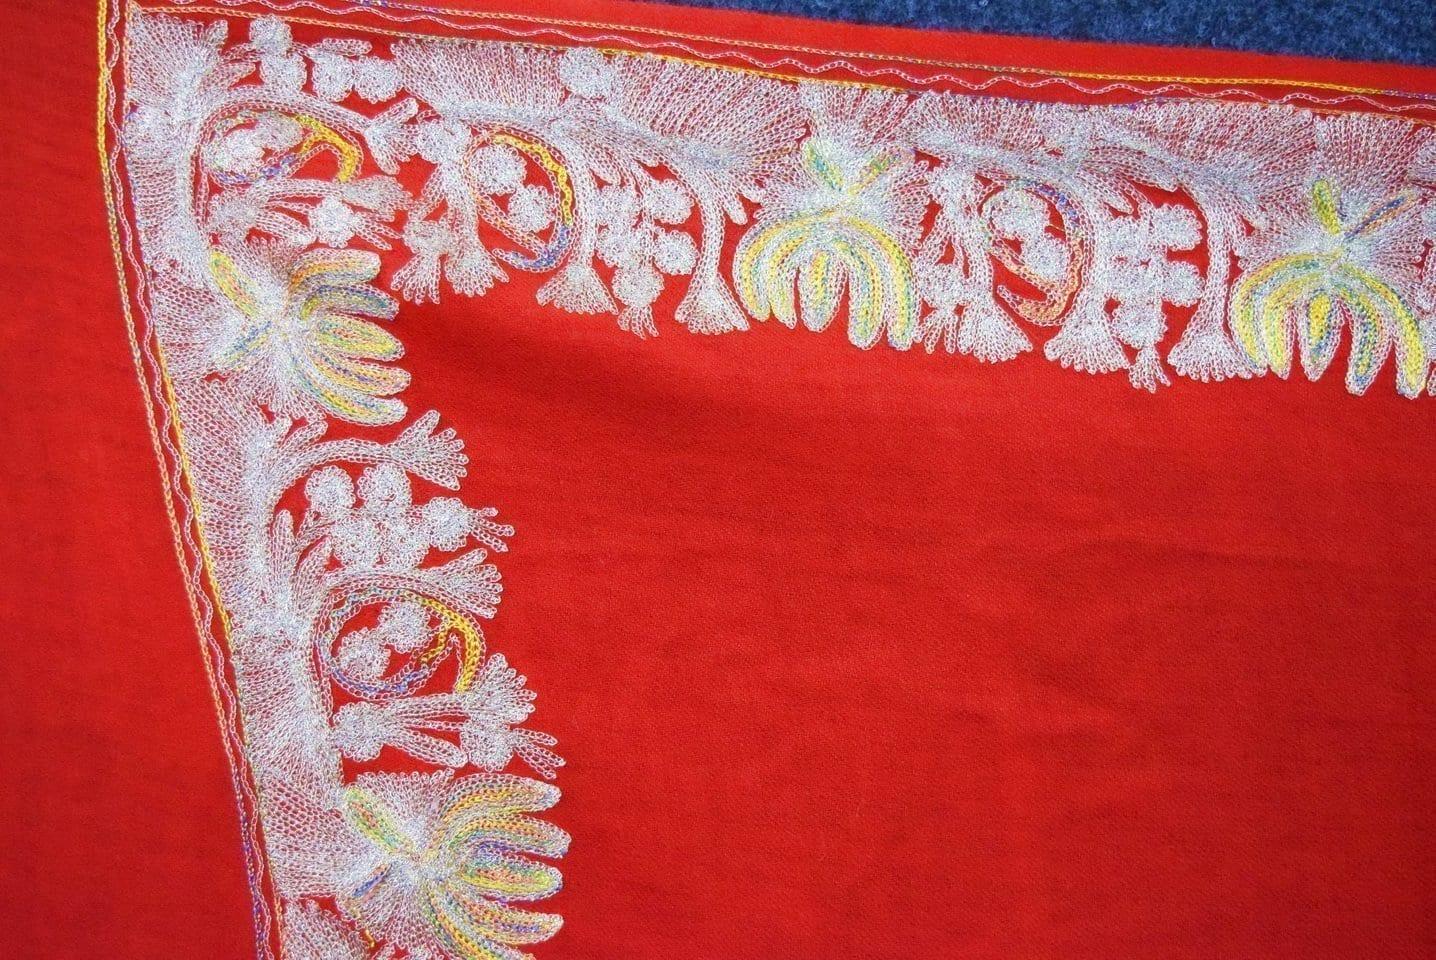 Bridal Red Kashmiri Shawl Zari Border Embroidery Work pure wool Pashmina wrap C0663 2